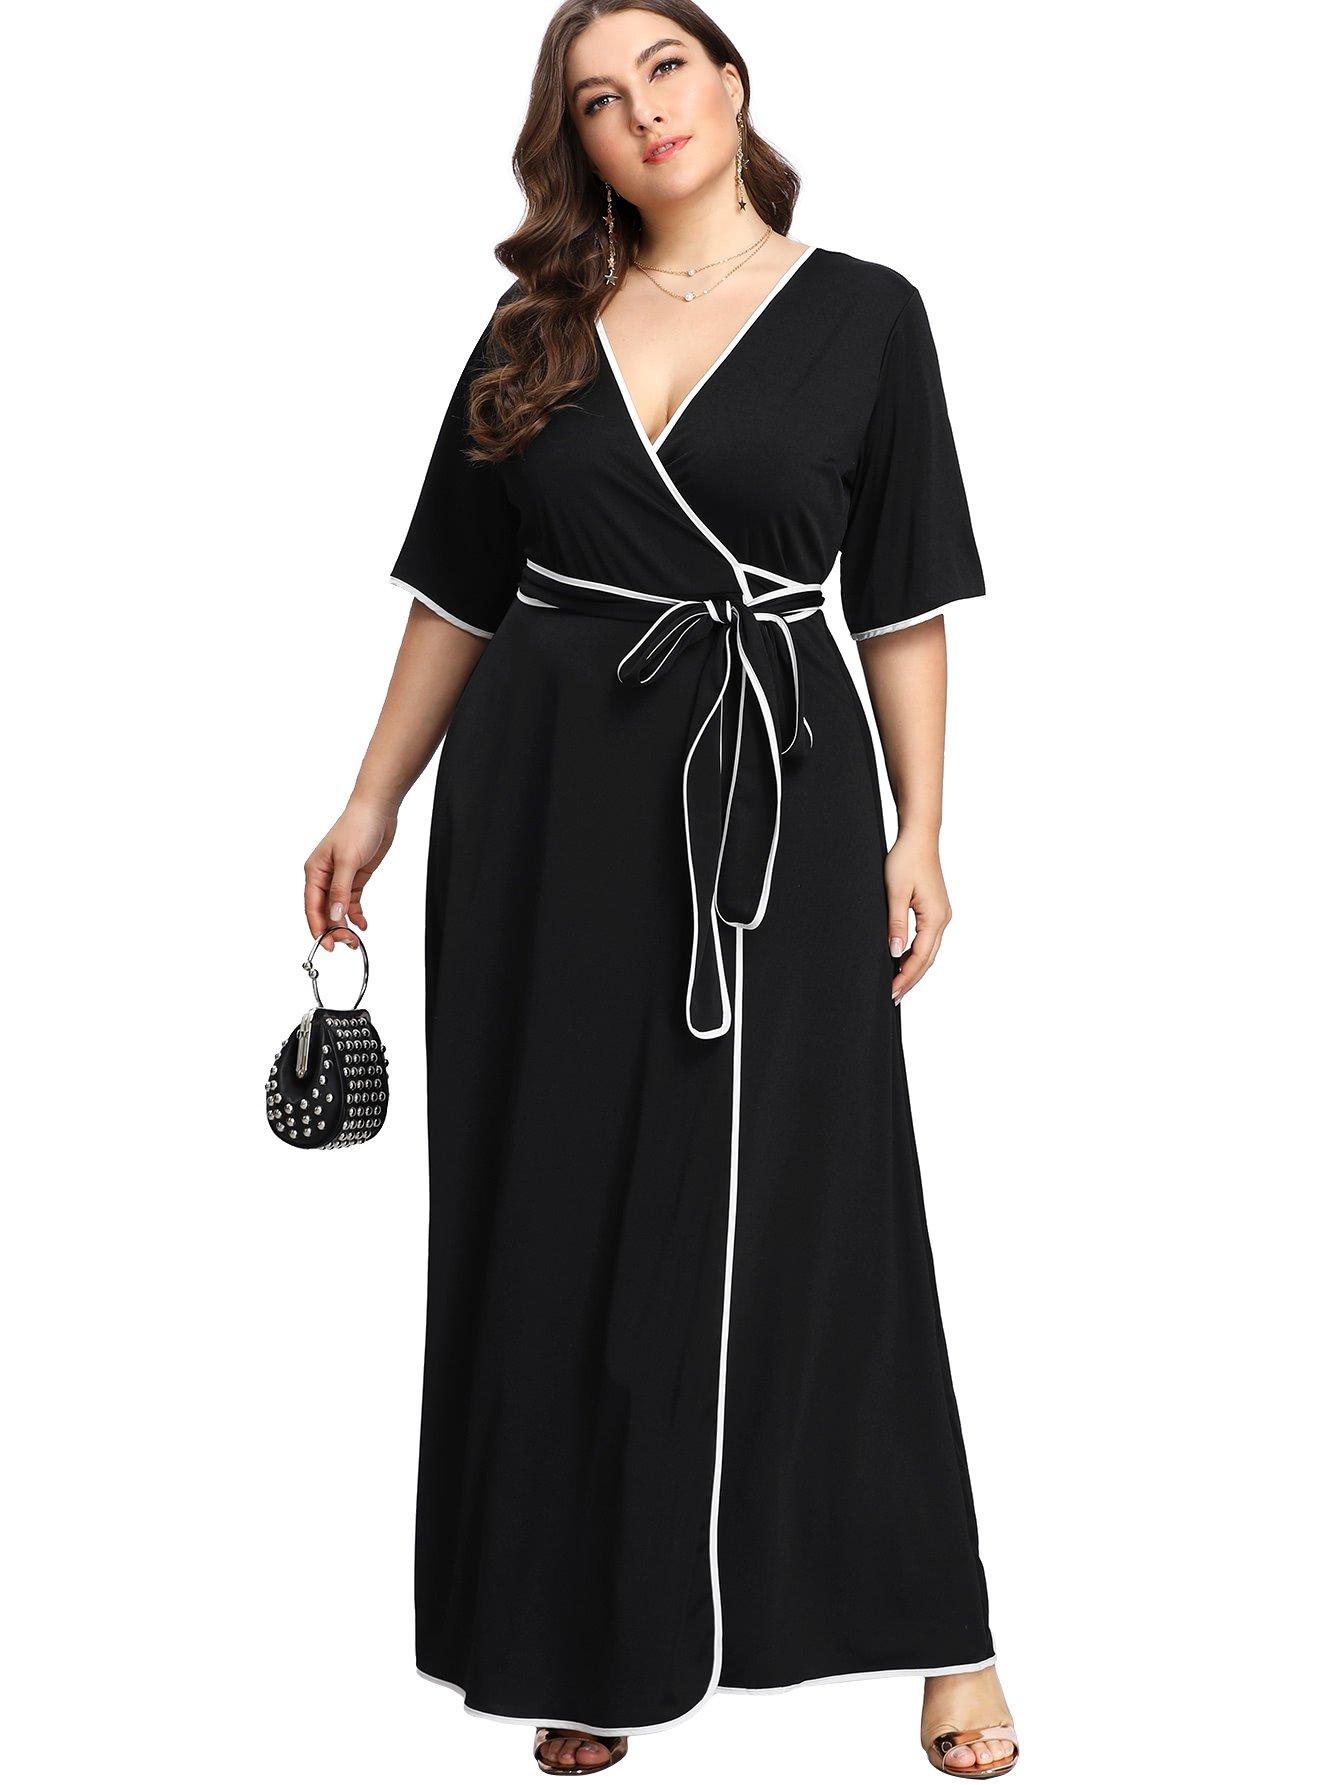 Romwe Women\'s Cute Plus Size Contrast Binding Belted Wrap V Neck Maxi Dress  Black 0XL